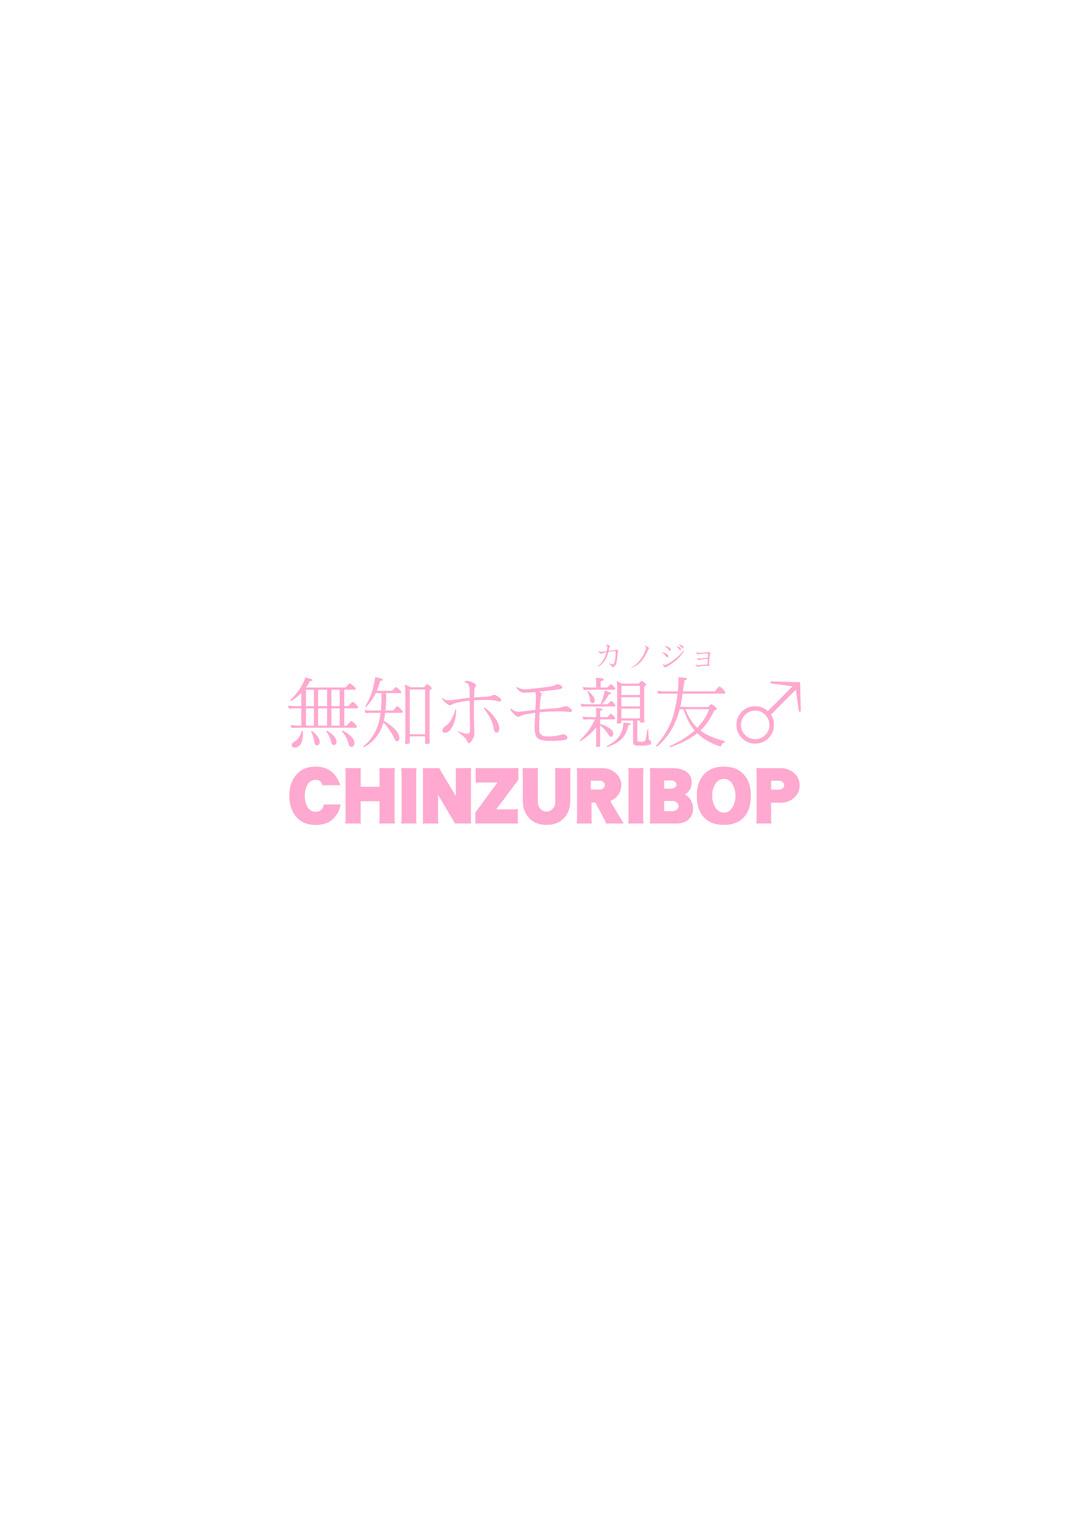 HentaiVN.net - Ảnh 28 - Muchi Homo Kanojo - My Best (Girl) Friend is an Ignorant Homo - Oneshot